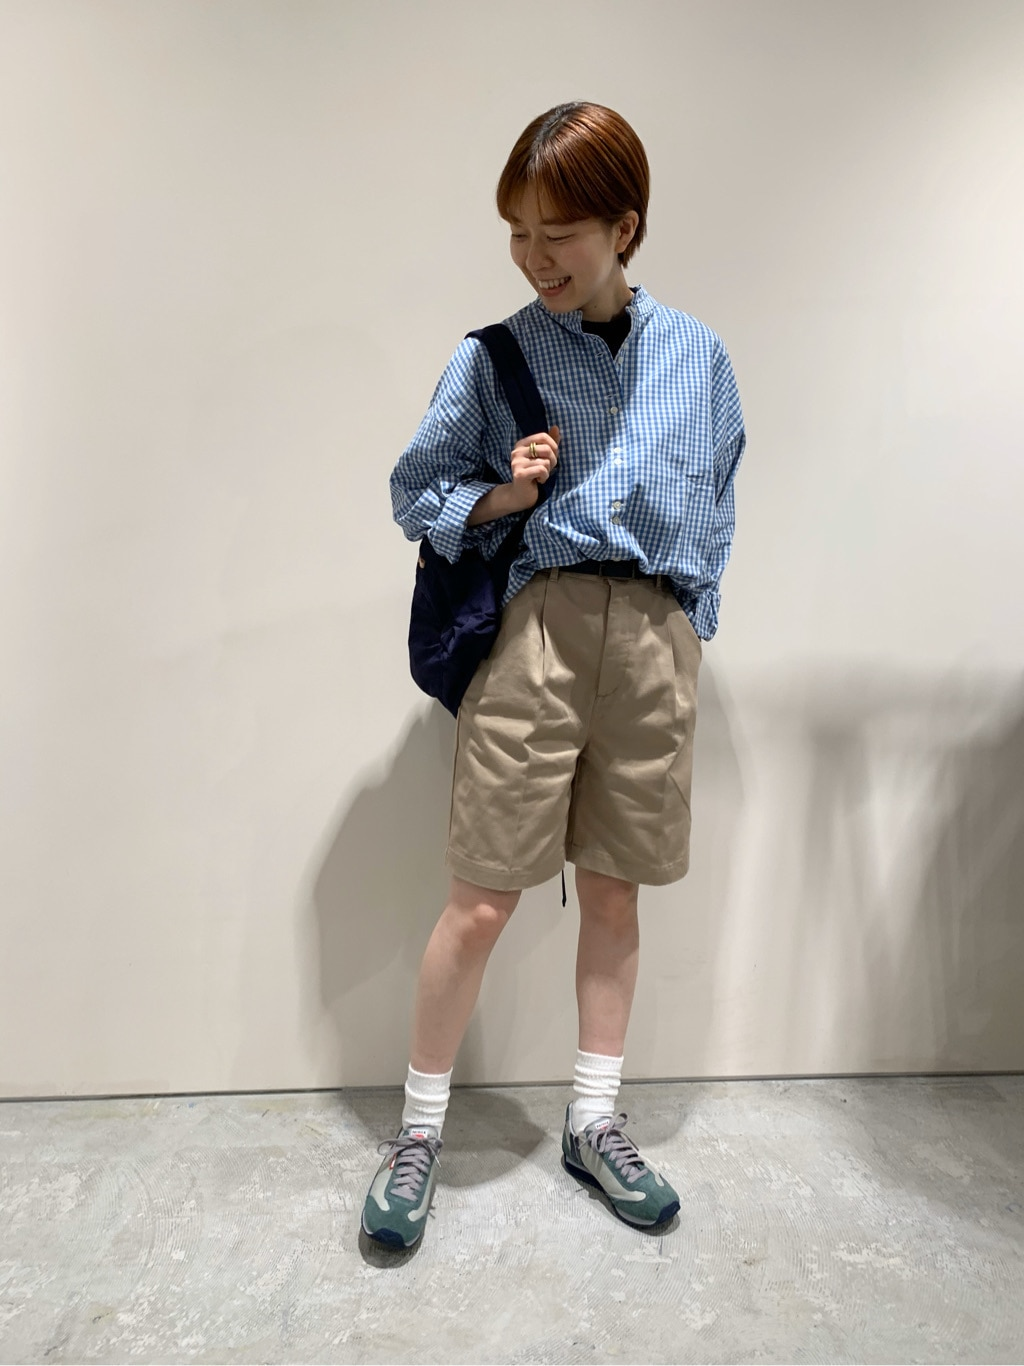 AMB SHOP CHILD WOMAN CHILD WOMAN , PAR ICI ルミネ横浜 身長:158cm 2020.07.11